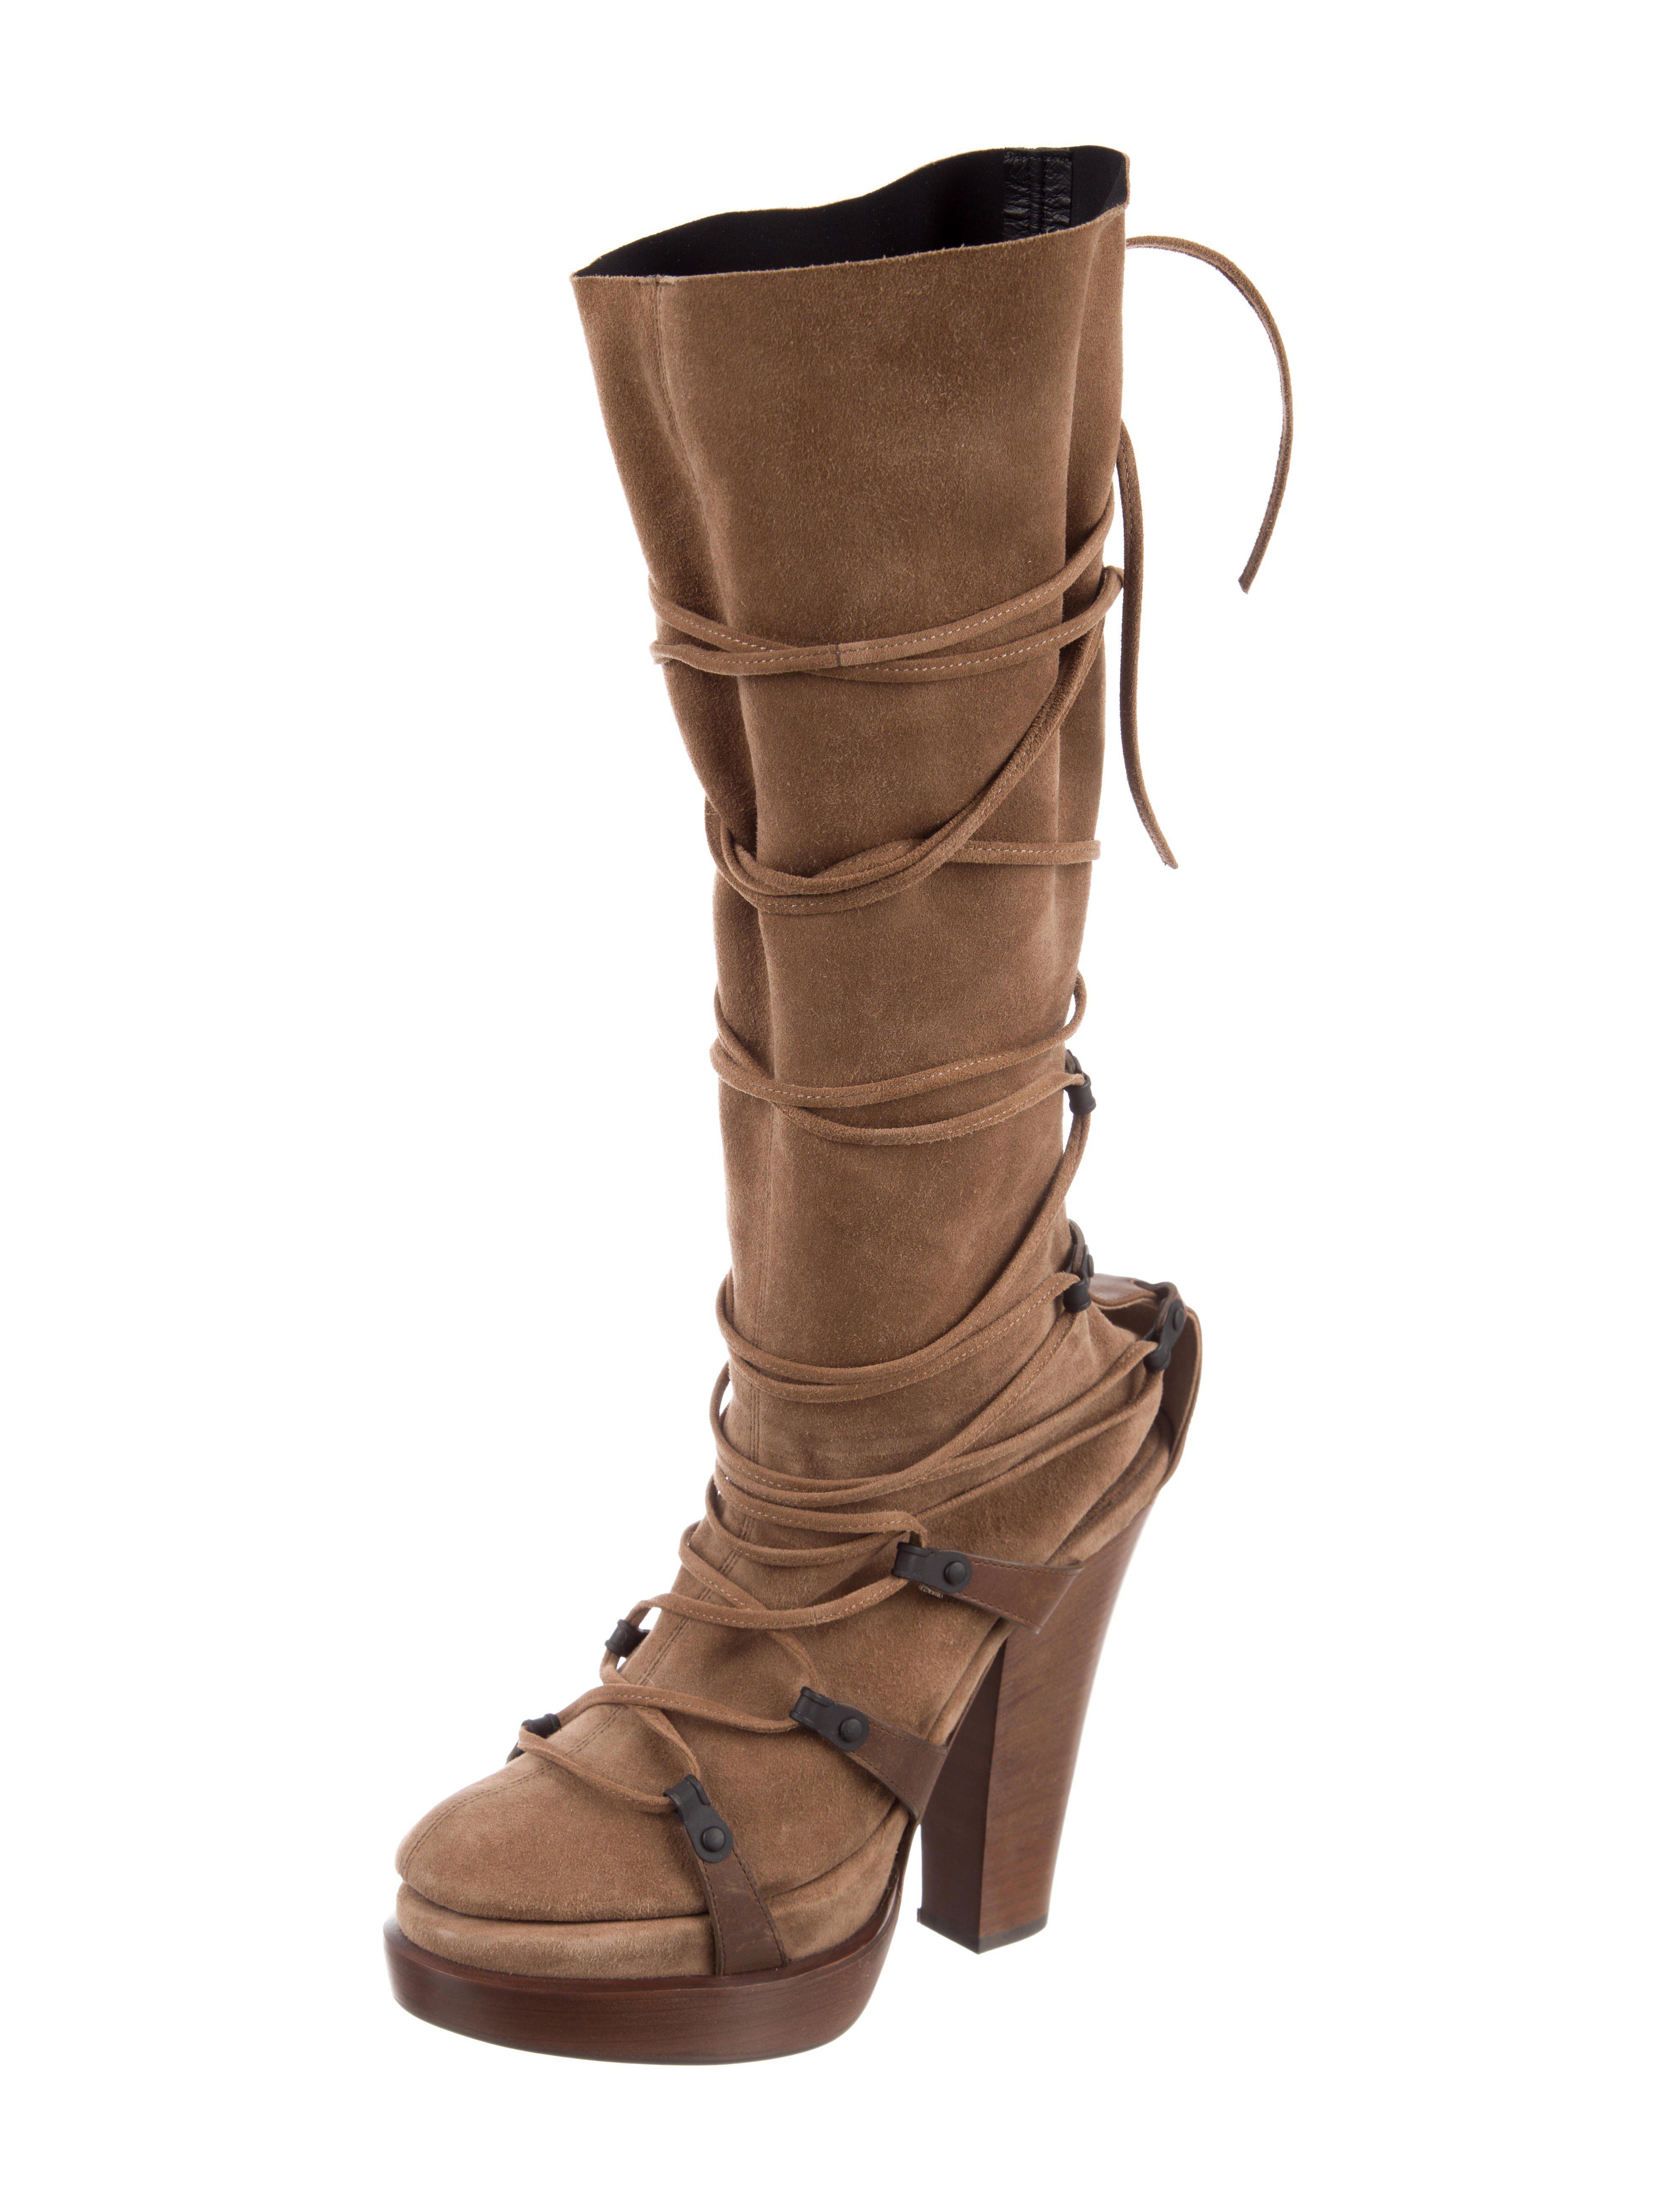 Bottega Veneta Multi-Strap Mid-Calf Boots cheap wide range of discount eastbay 2sr3WLu1